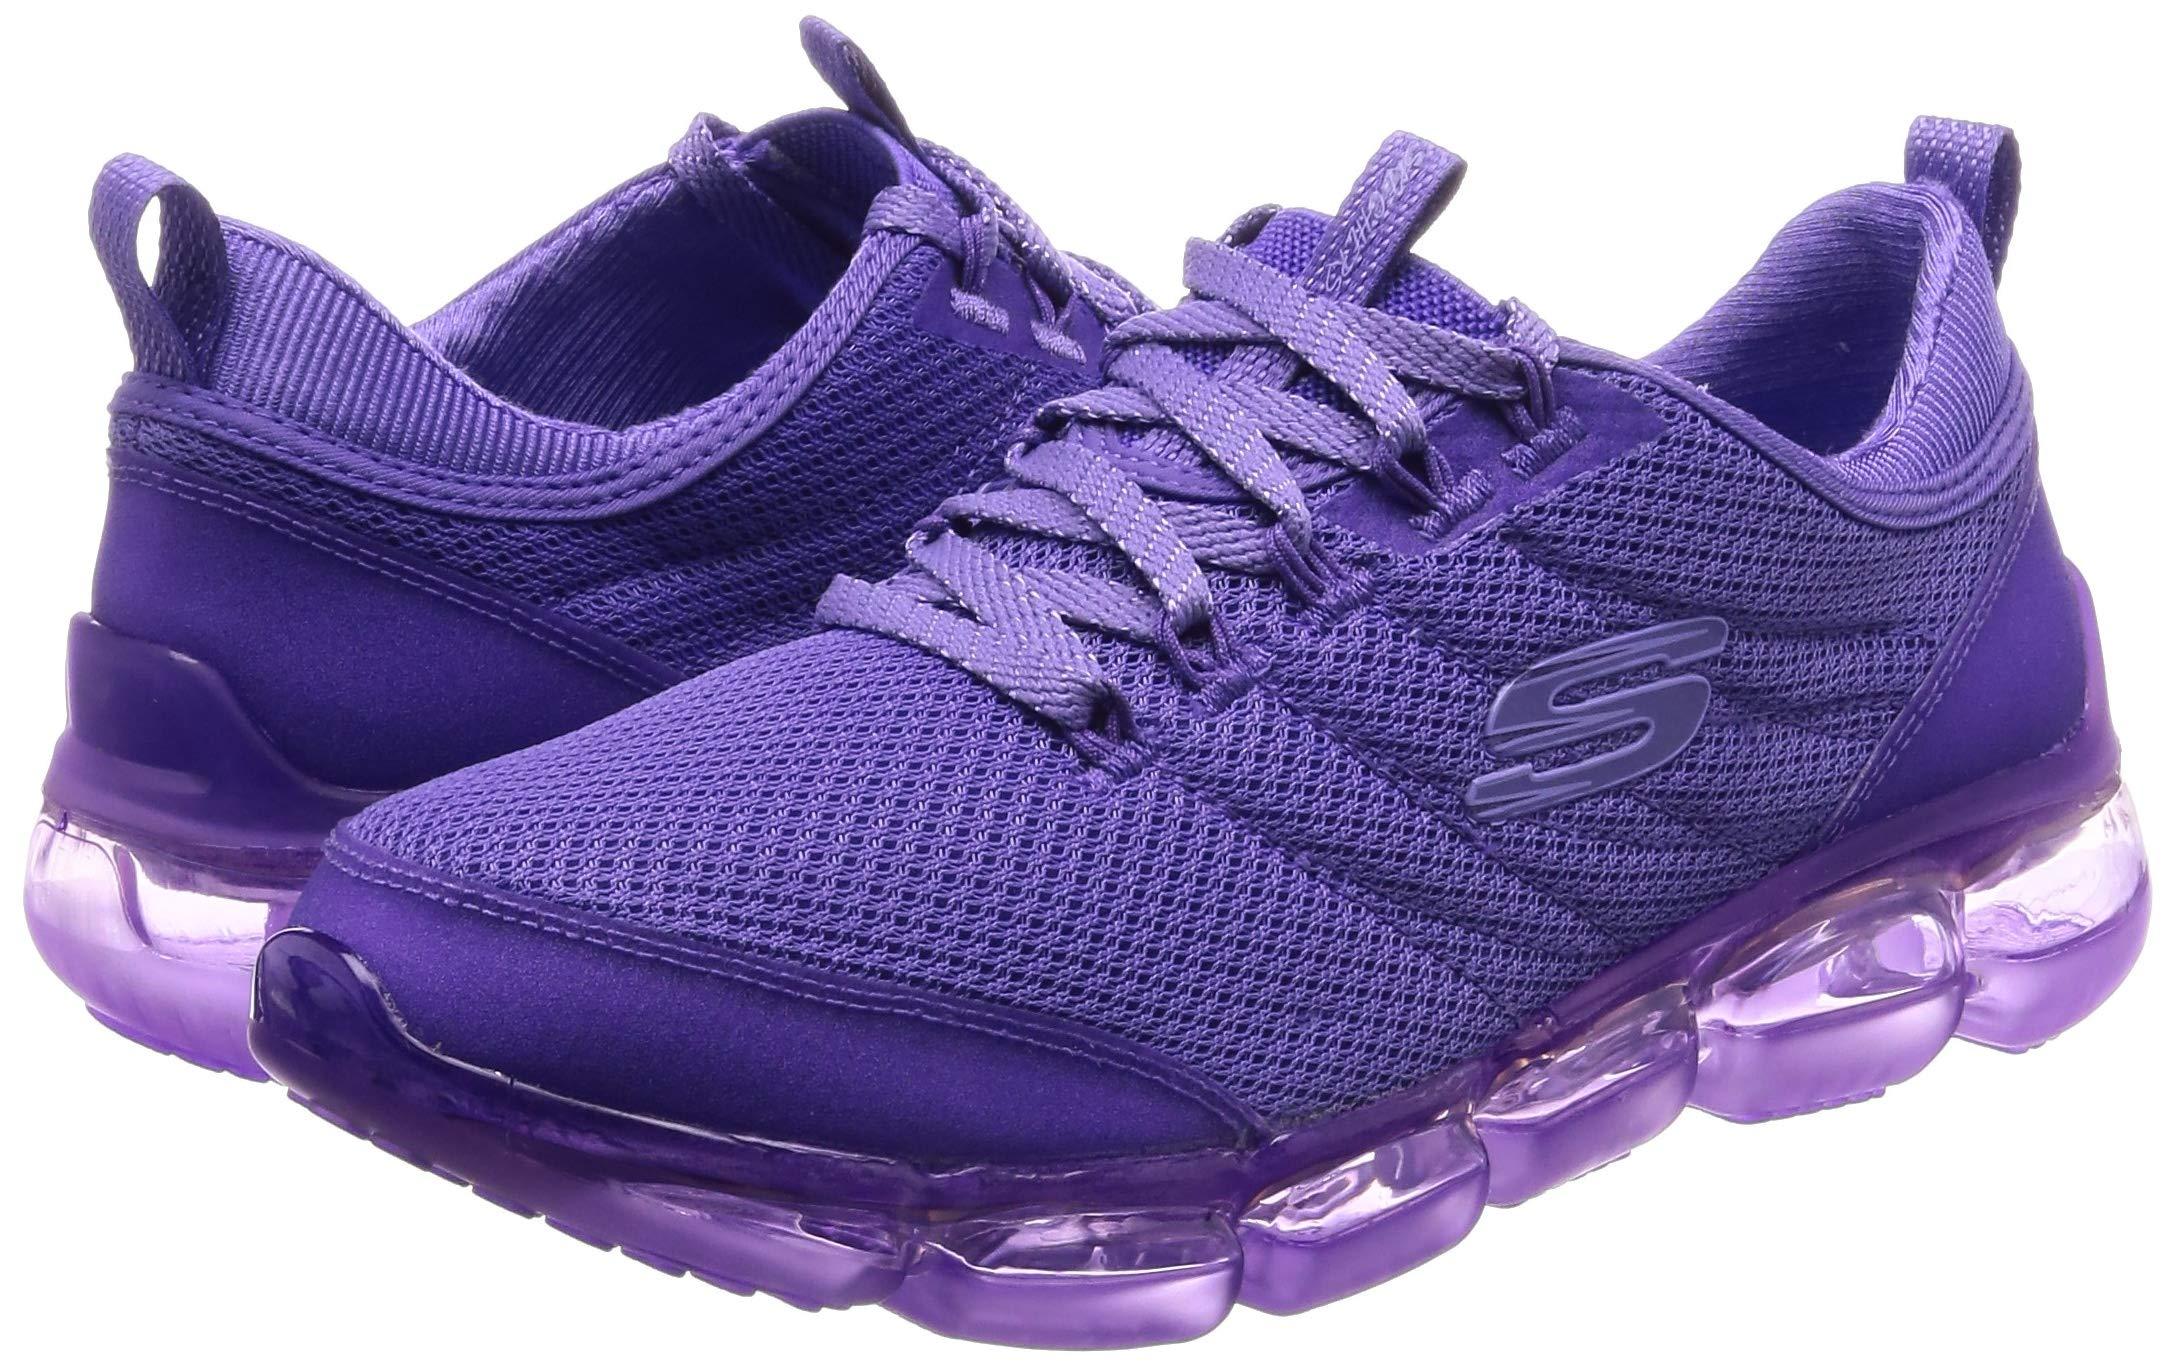 aborto Transparentemente Ventana mundial  Skechers Women's Skech-air 92-Significance Sneaker- Buy Online in Andorra  at andorra.desertcart.com. ProductId : 204480504.